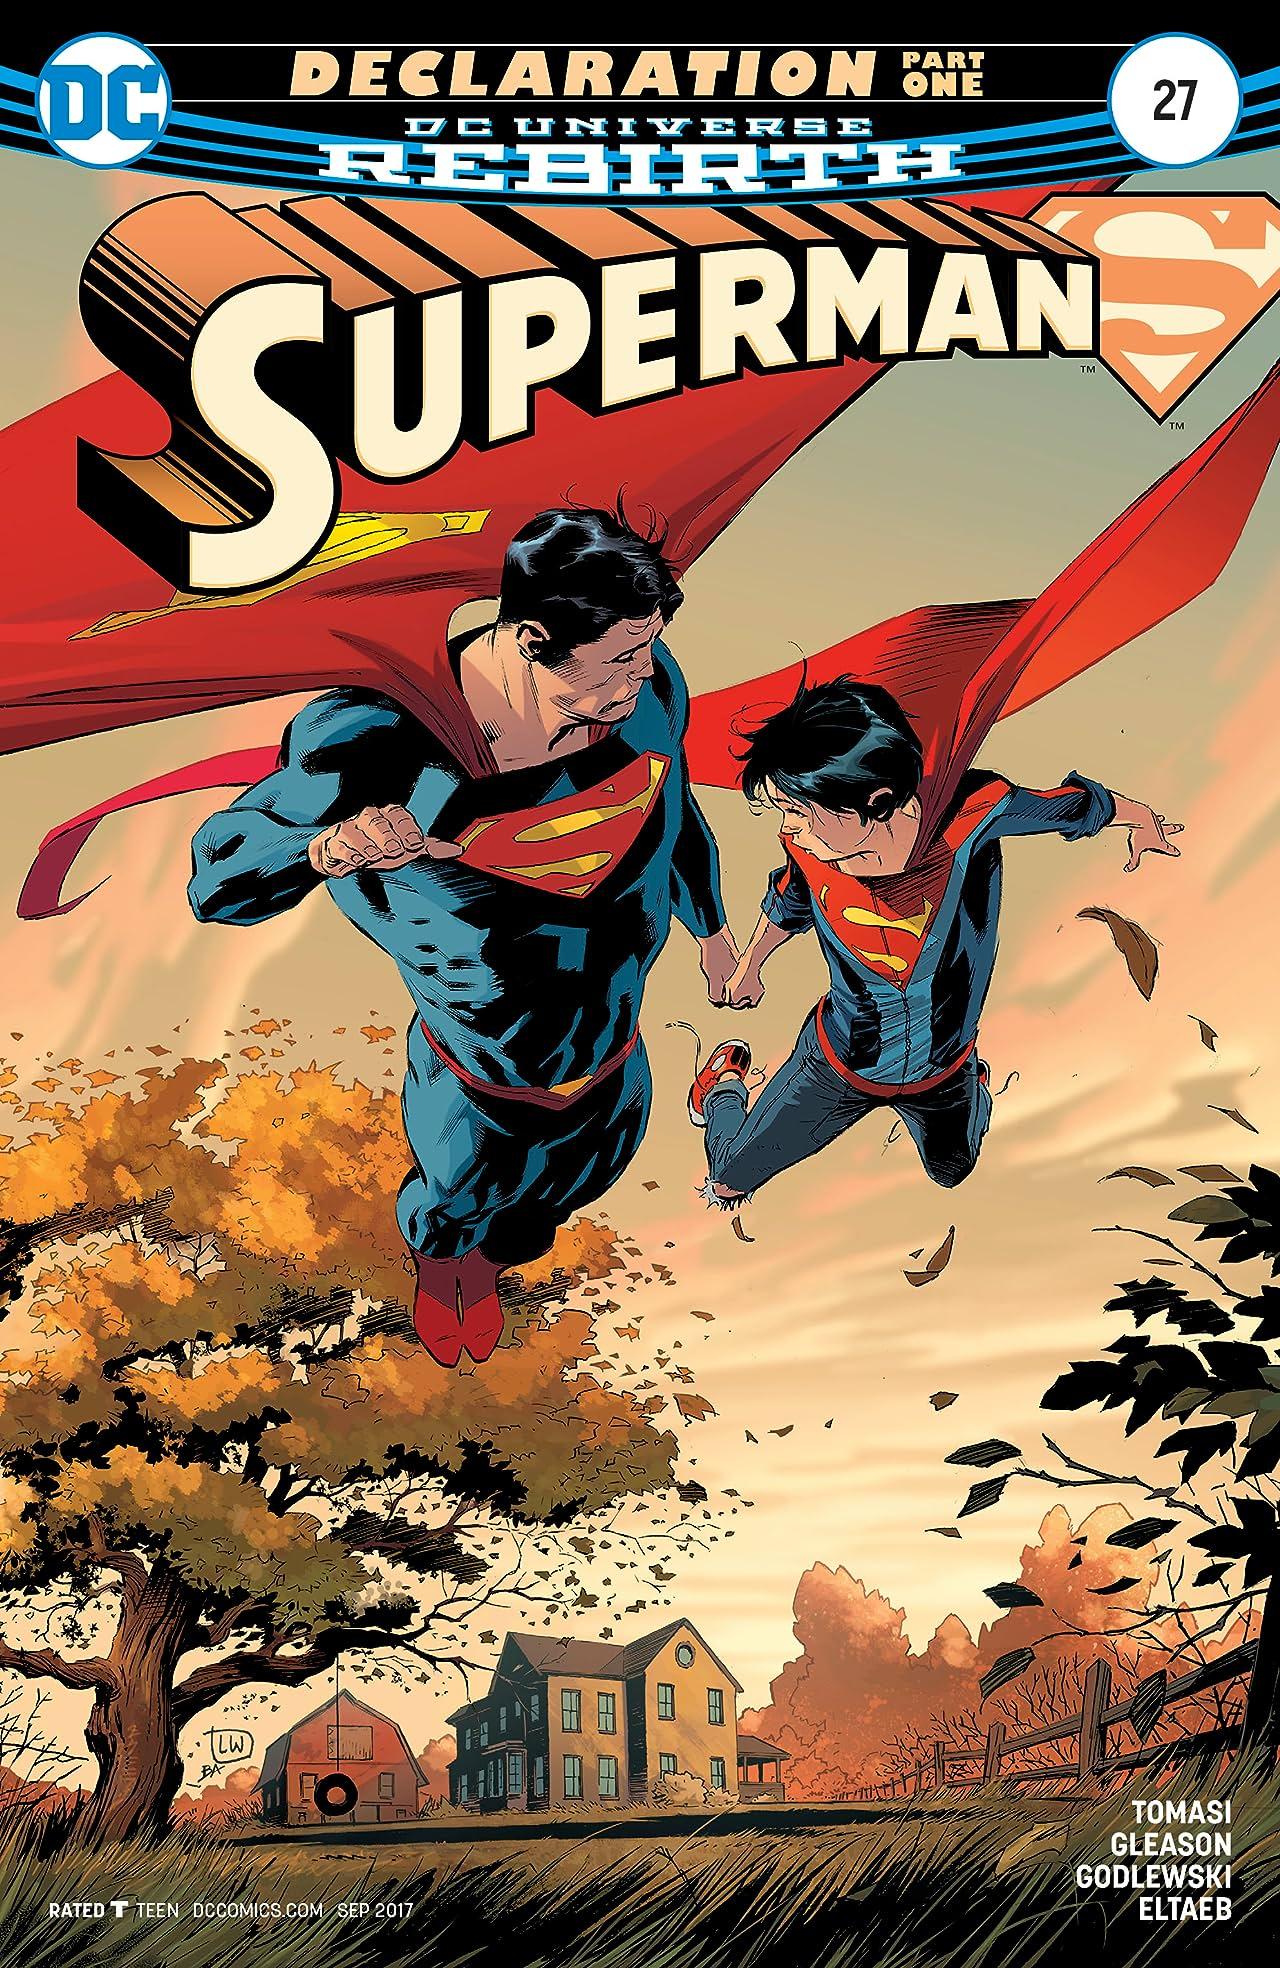 Superman (2016-) #27